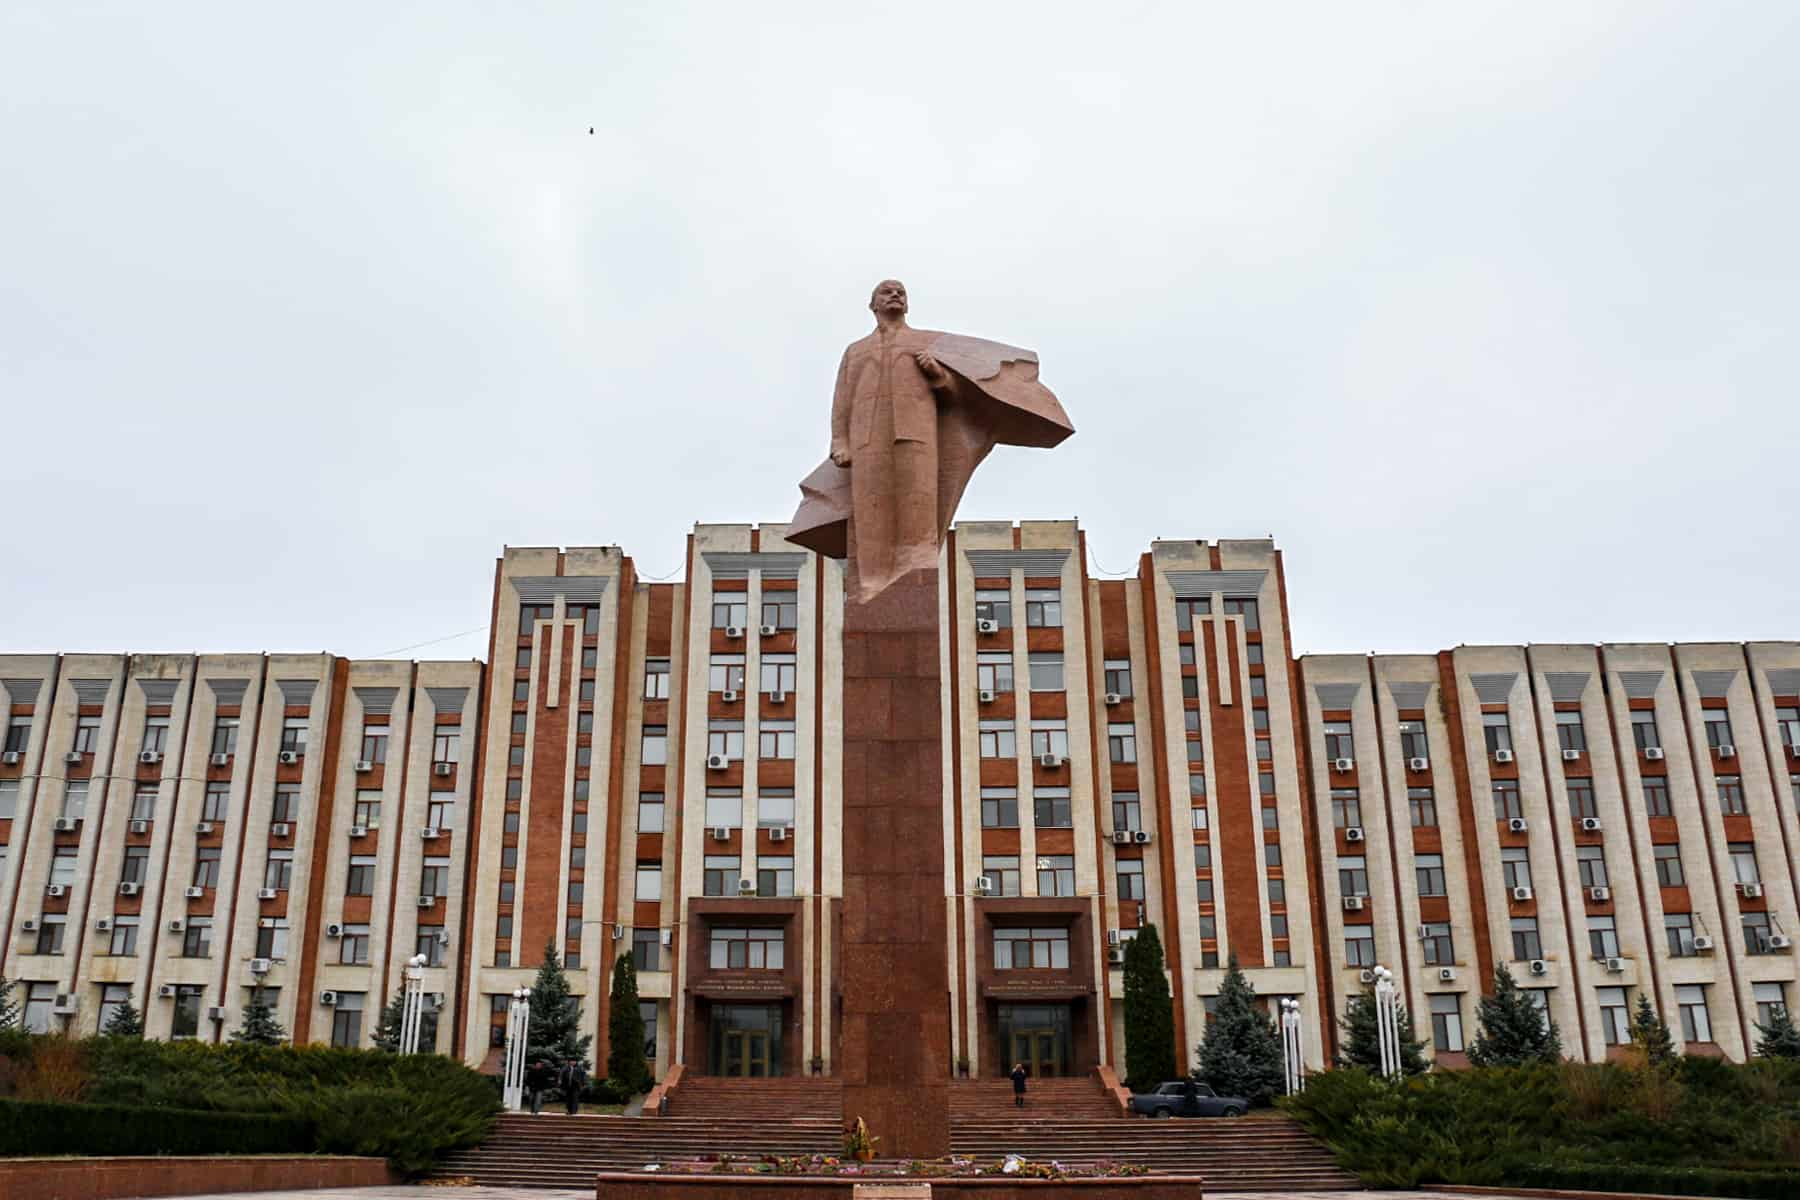 Statue of Vladimir Lenin in Tiraspol